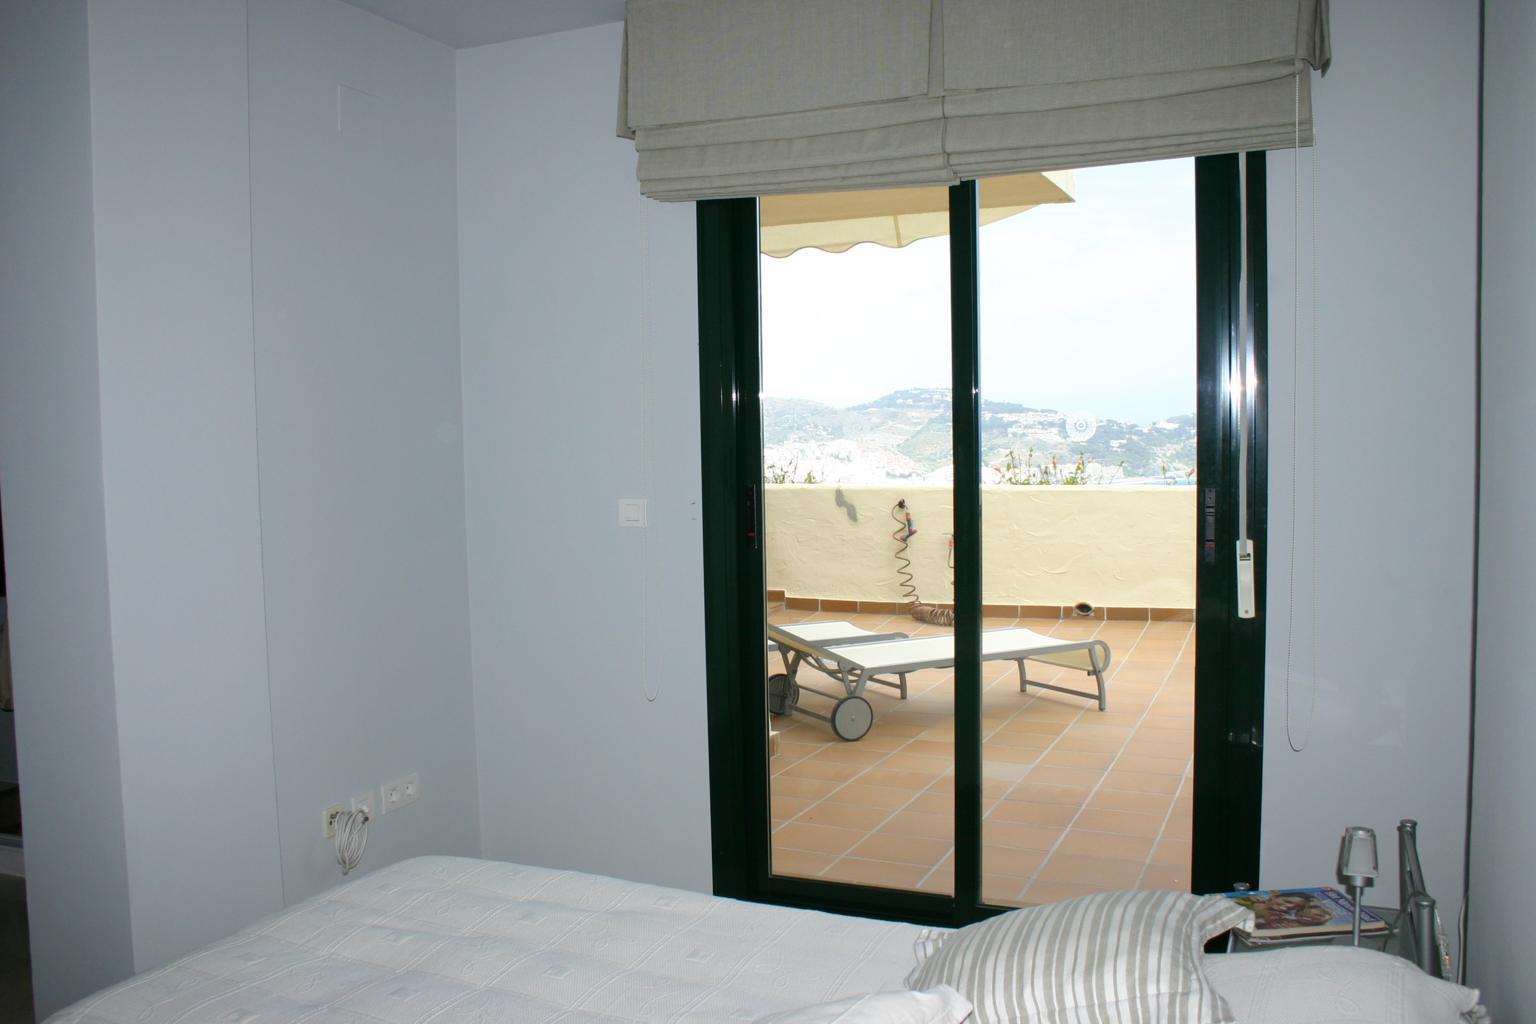 Elegant townhouse on the edge of cerro gordo in la herradura las espanas properties Master bedroom with terrace